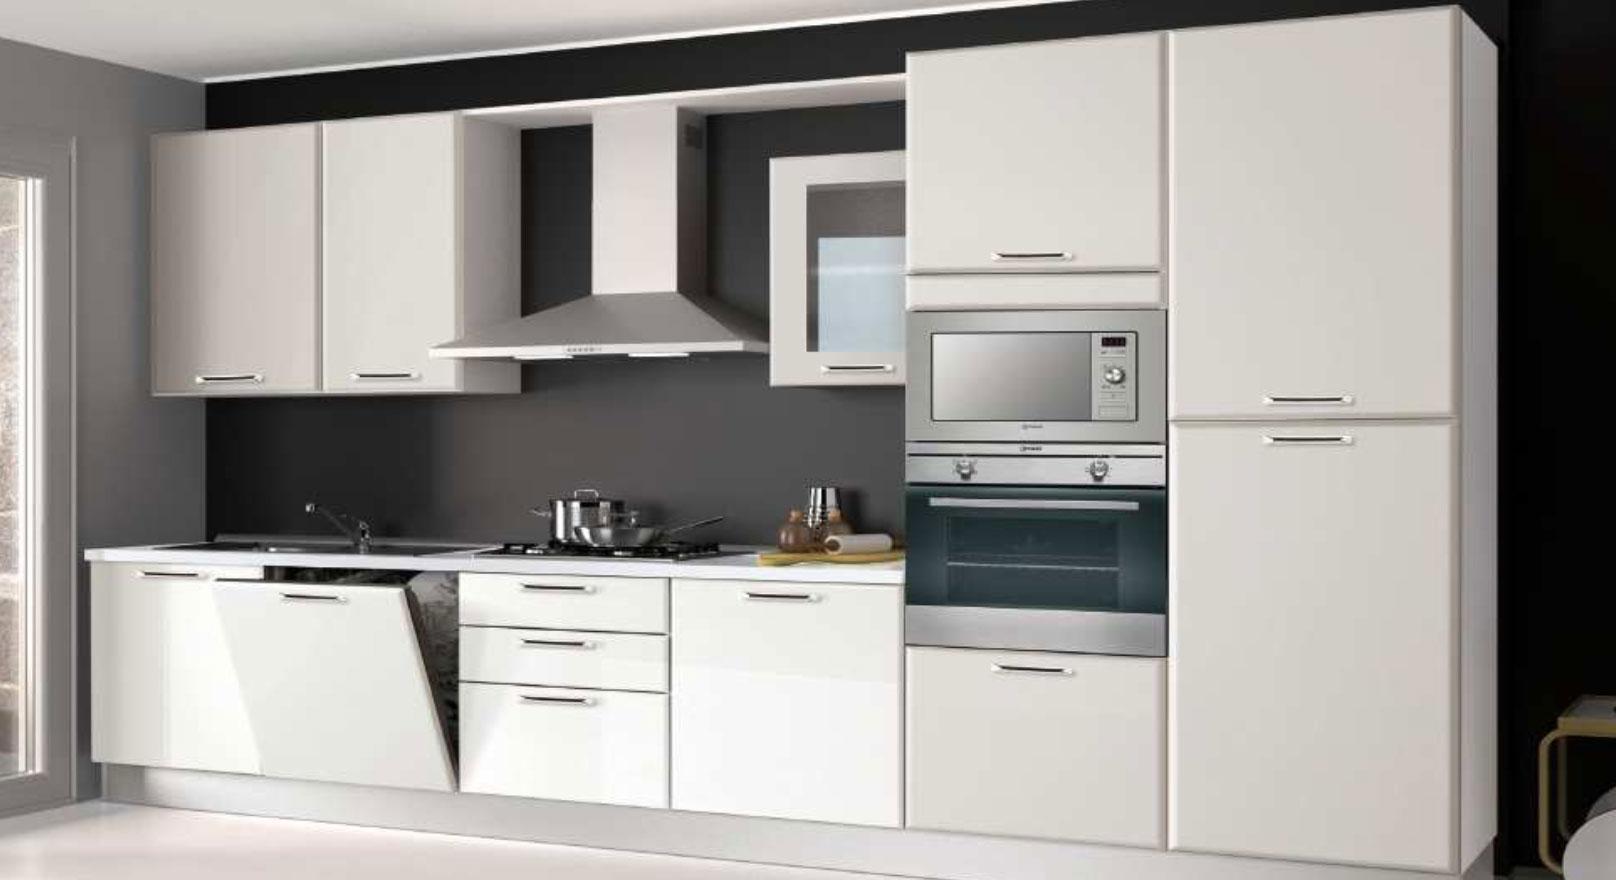 Cucina creo mt composizione standard chiavi in mano for Cucina moderna 3 60